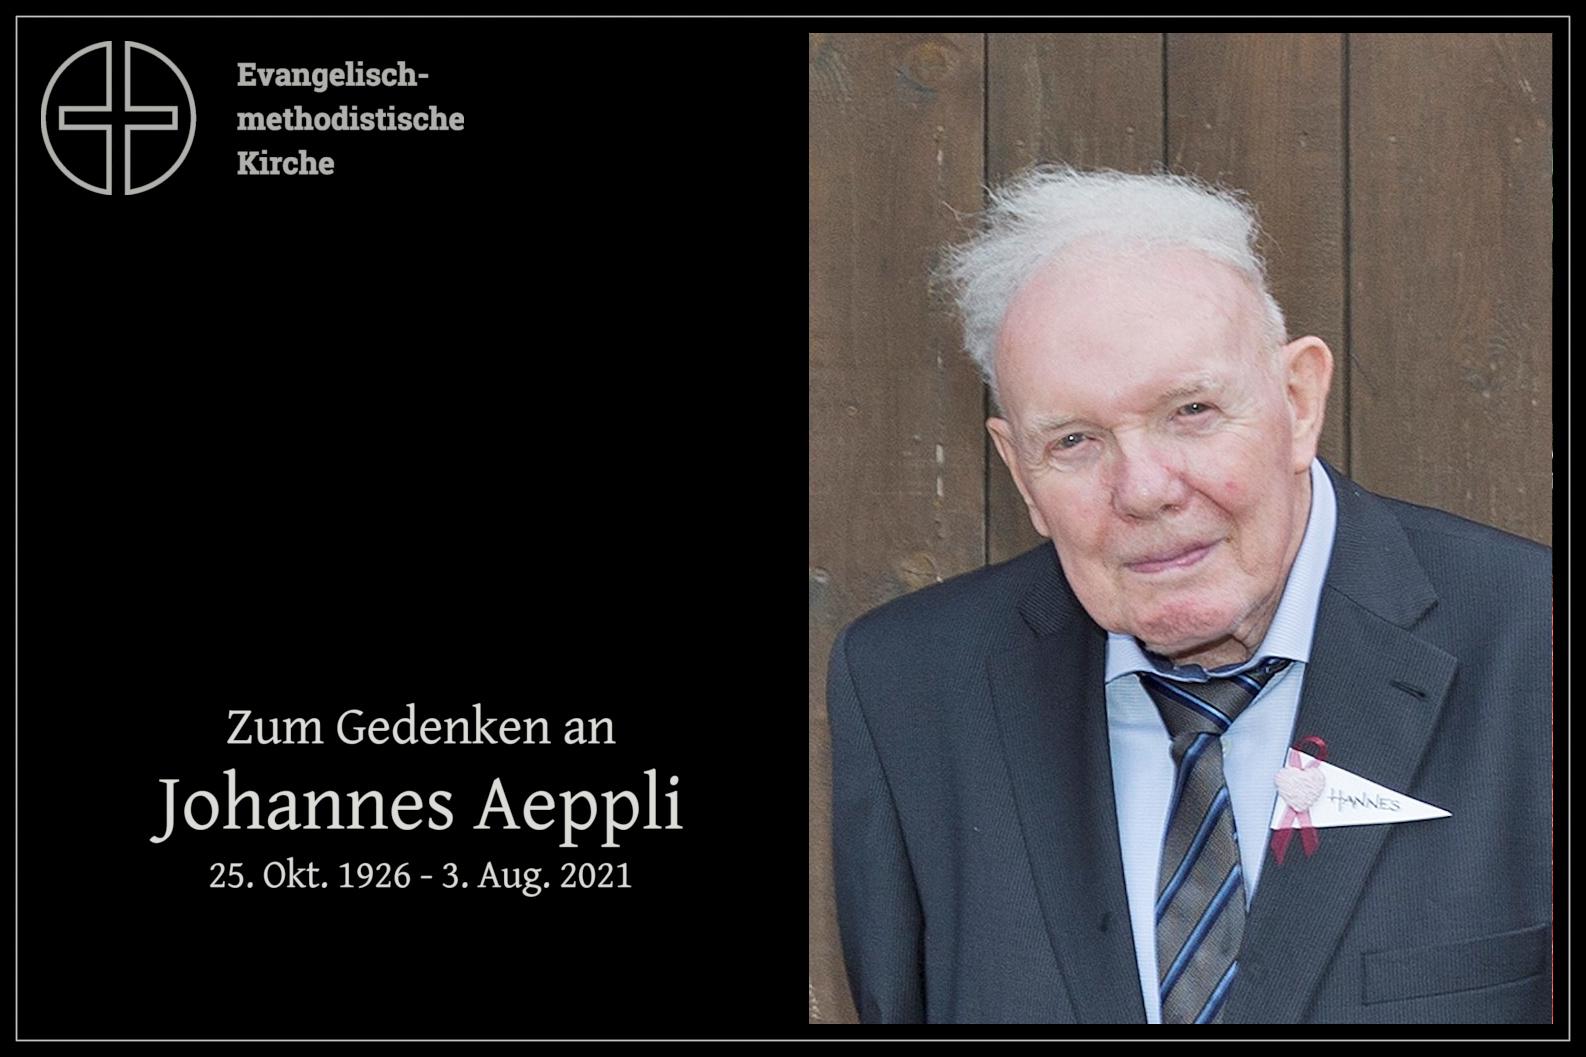 Johannes Aeppli